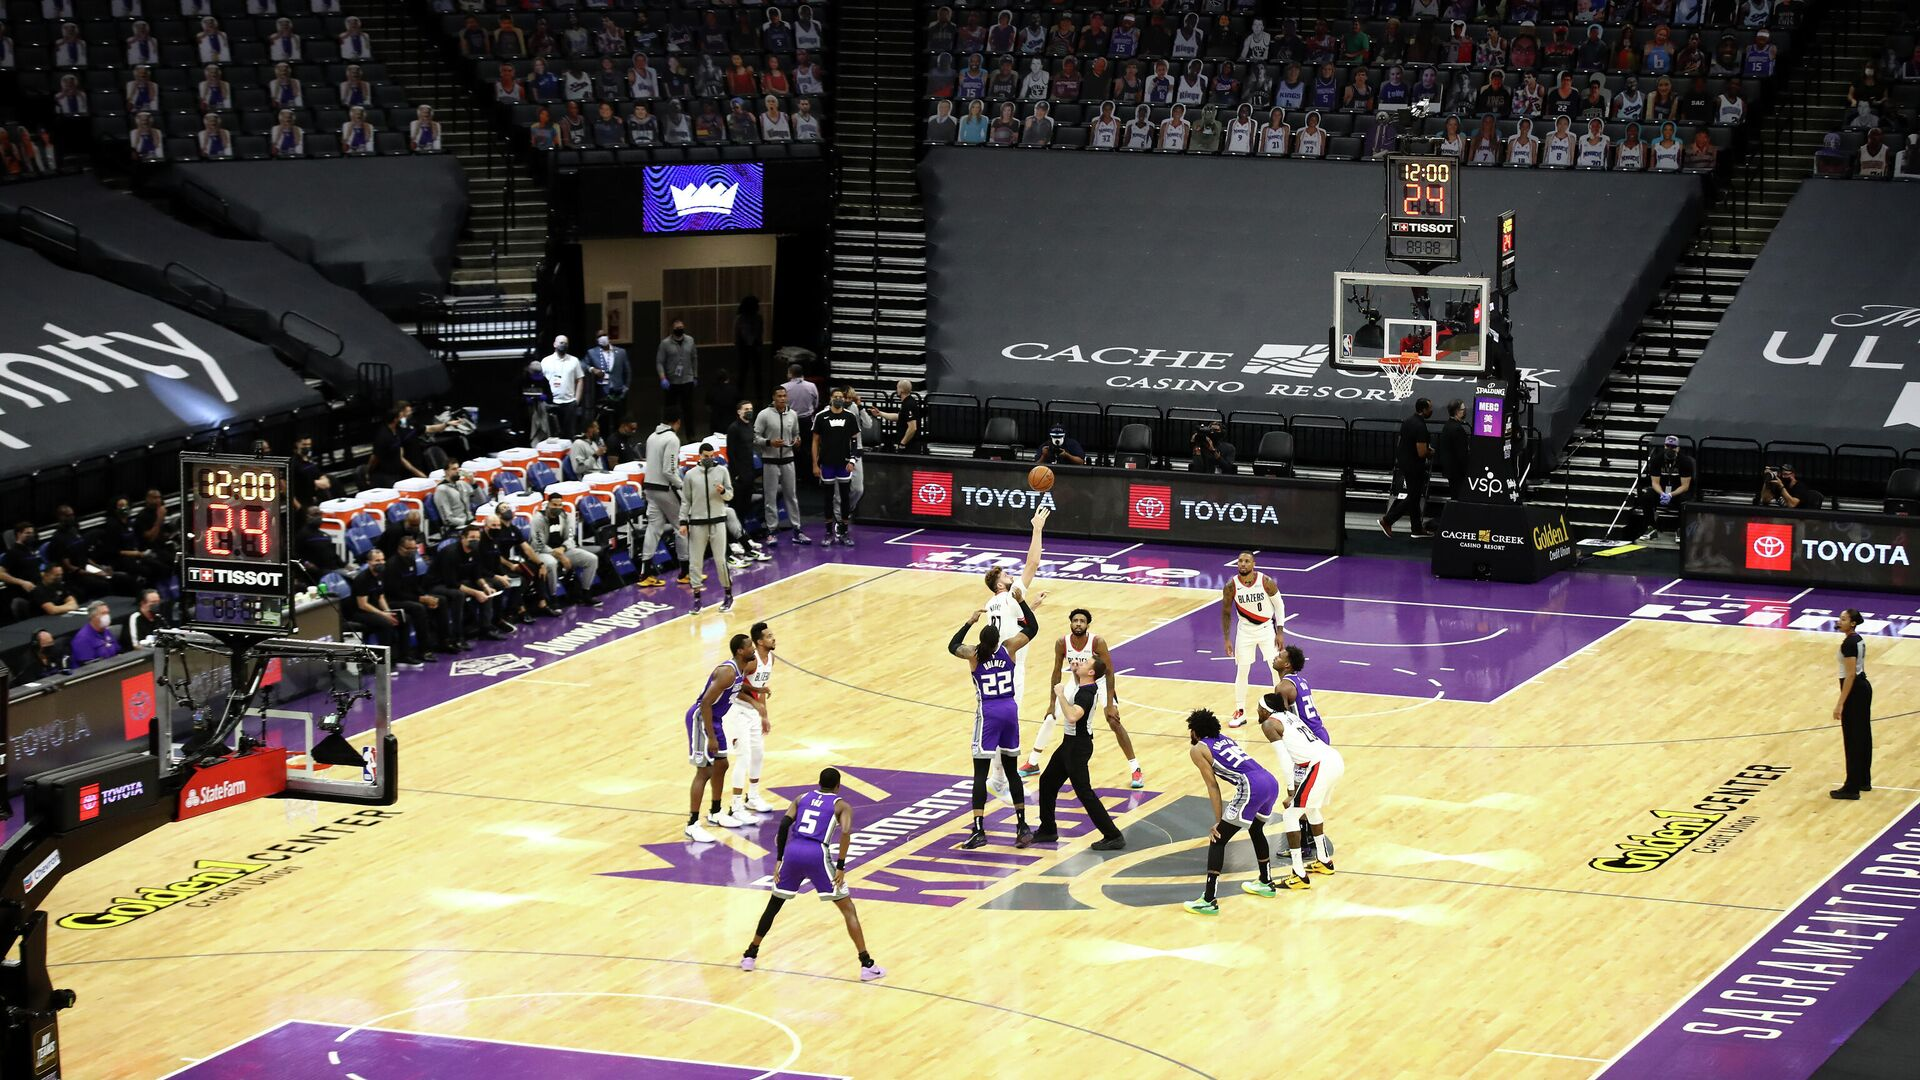 Игровой момент матча НБА Портленд Трэйл Блэйзерс - Сакраменто Кингз - РИА Новости, 1920, 14.01.2021